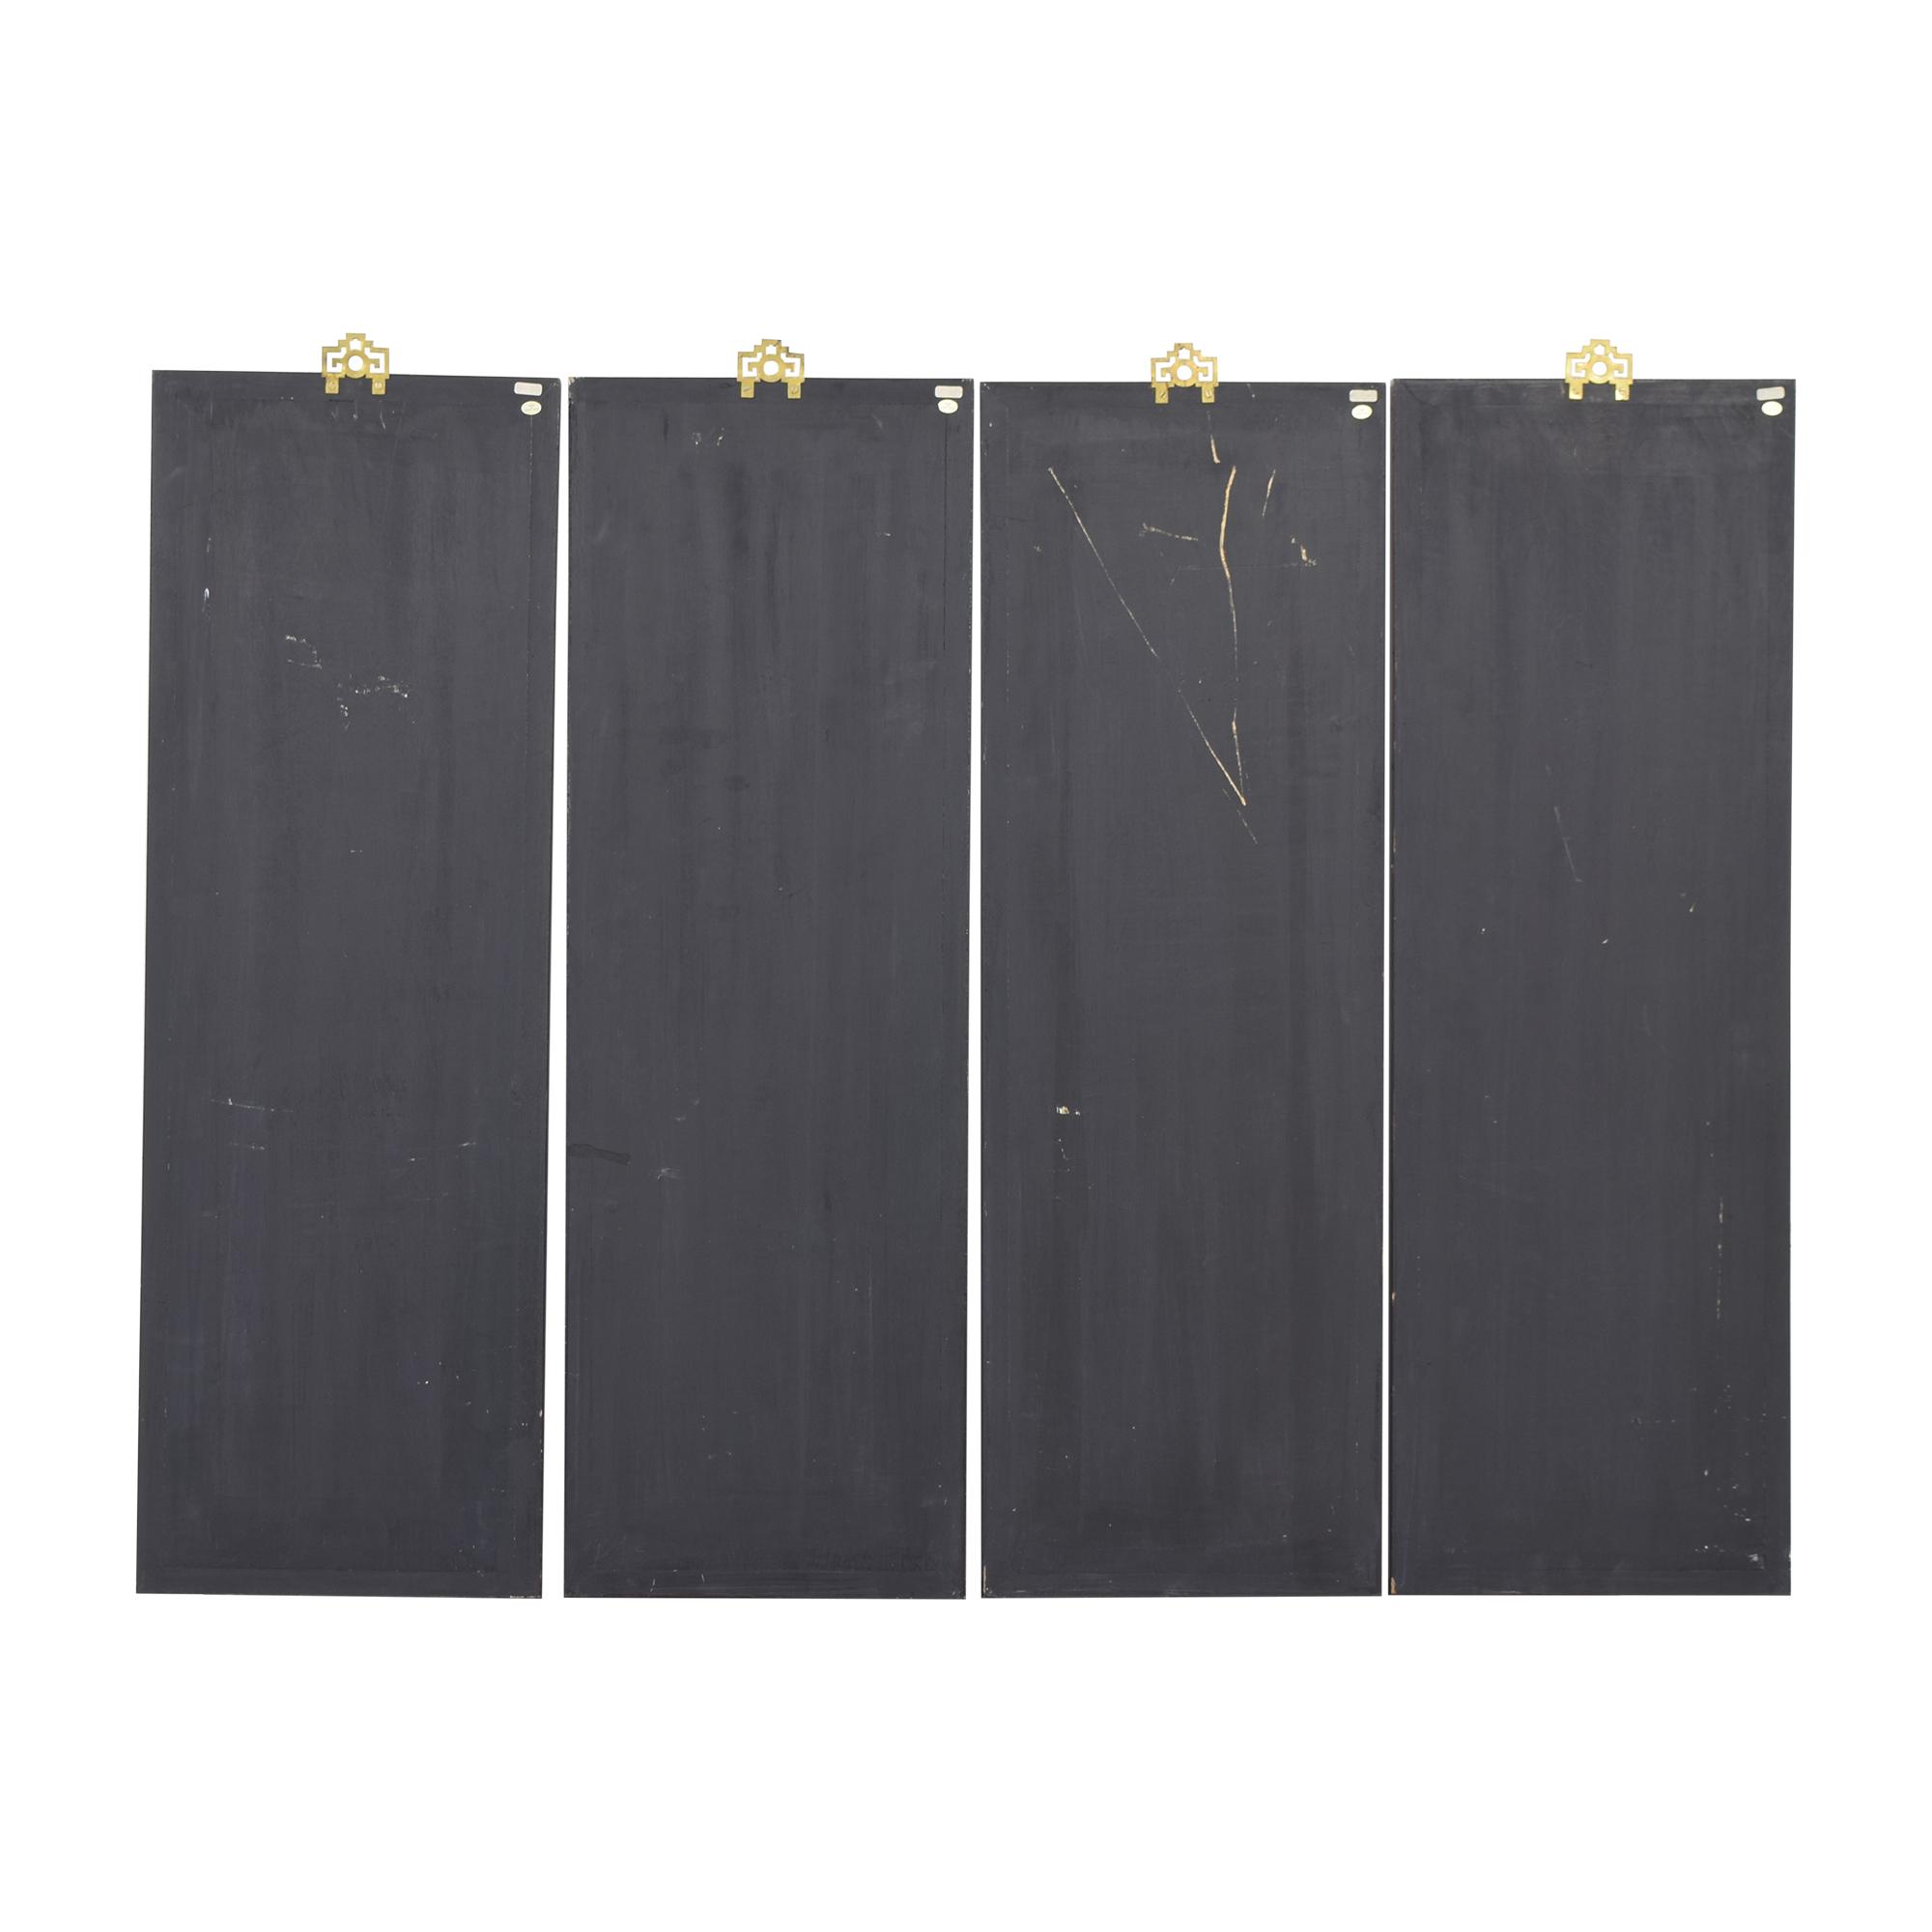 Hanging Wall Art Panels on sale